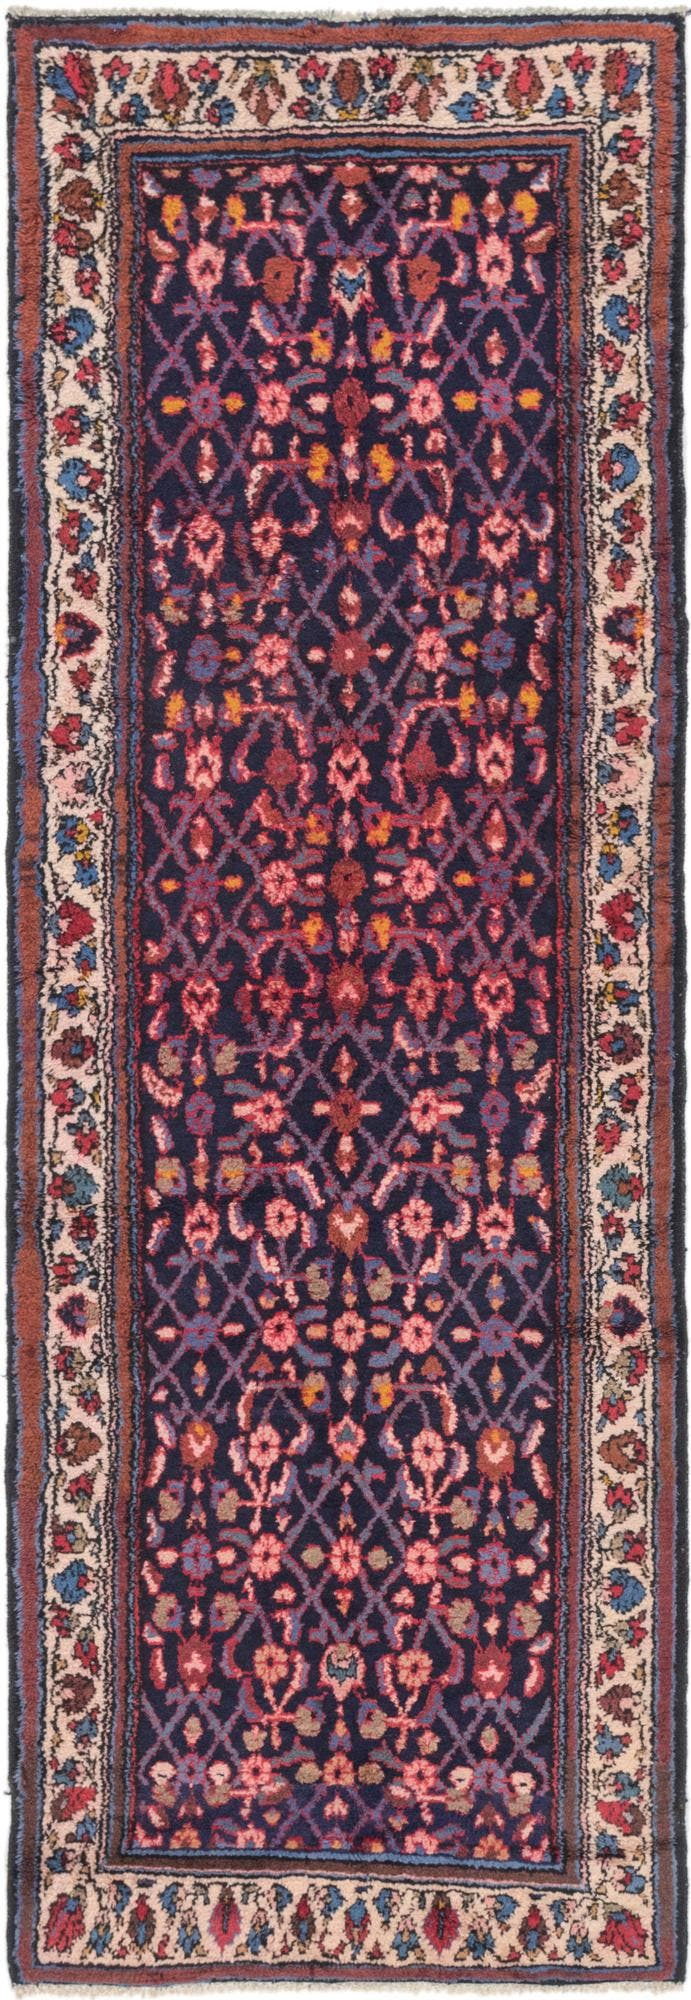 3' 7 x 9' 9 Malayer Persian Runner Rug main image